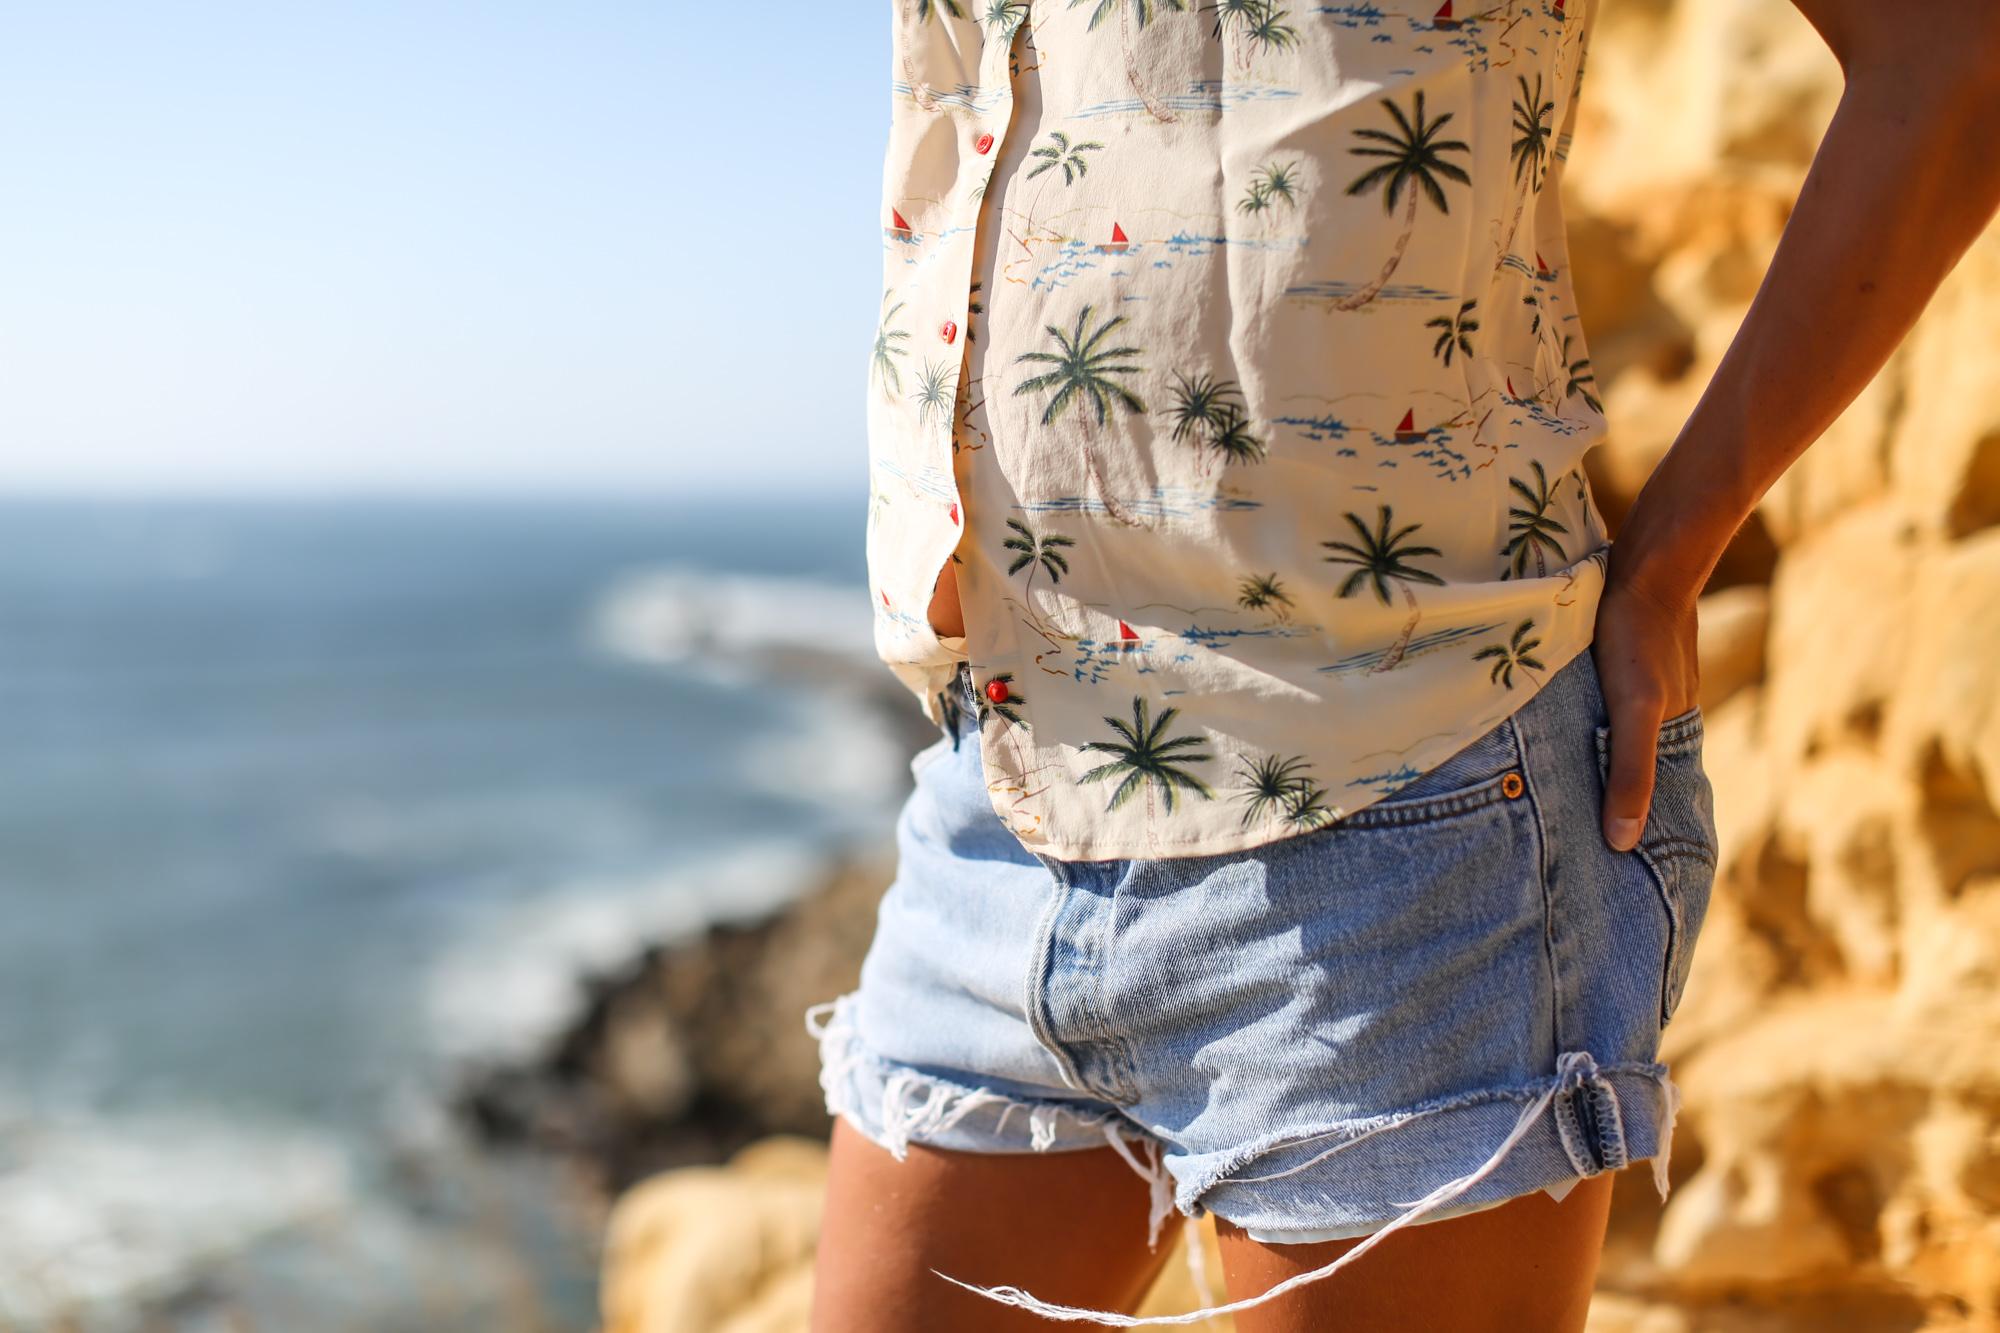 clochet_streetstyle_fashionblogger_levis501vintage_lespetithautssilkshirt